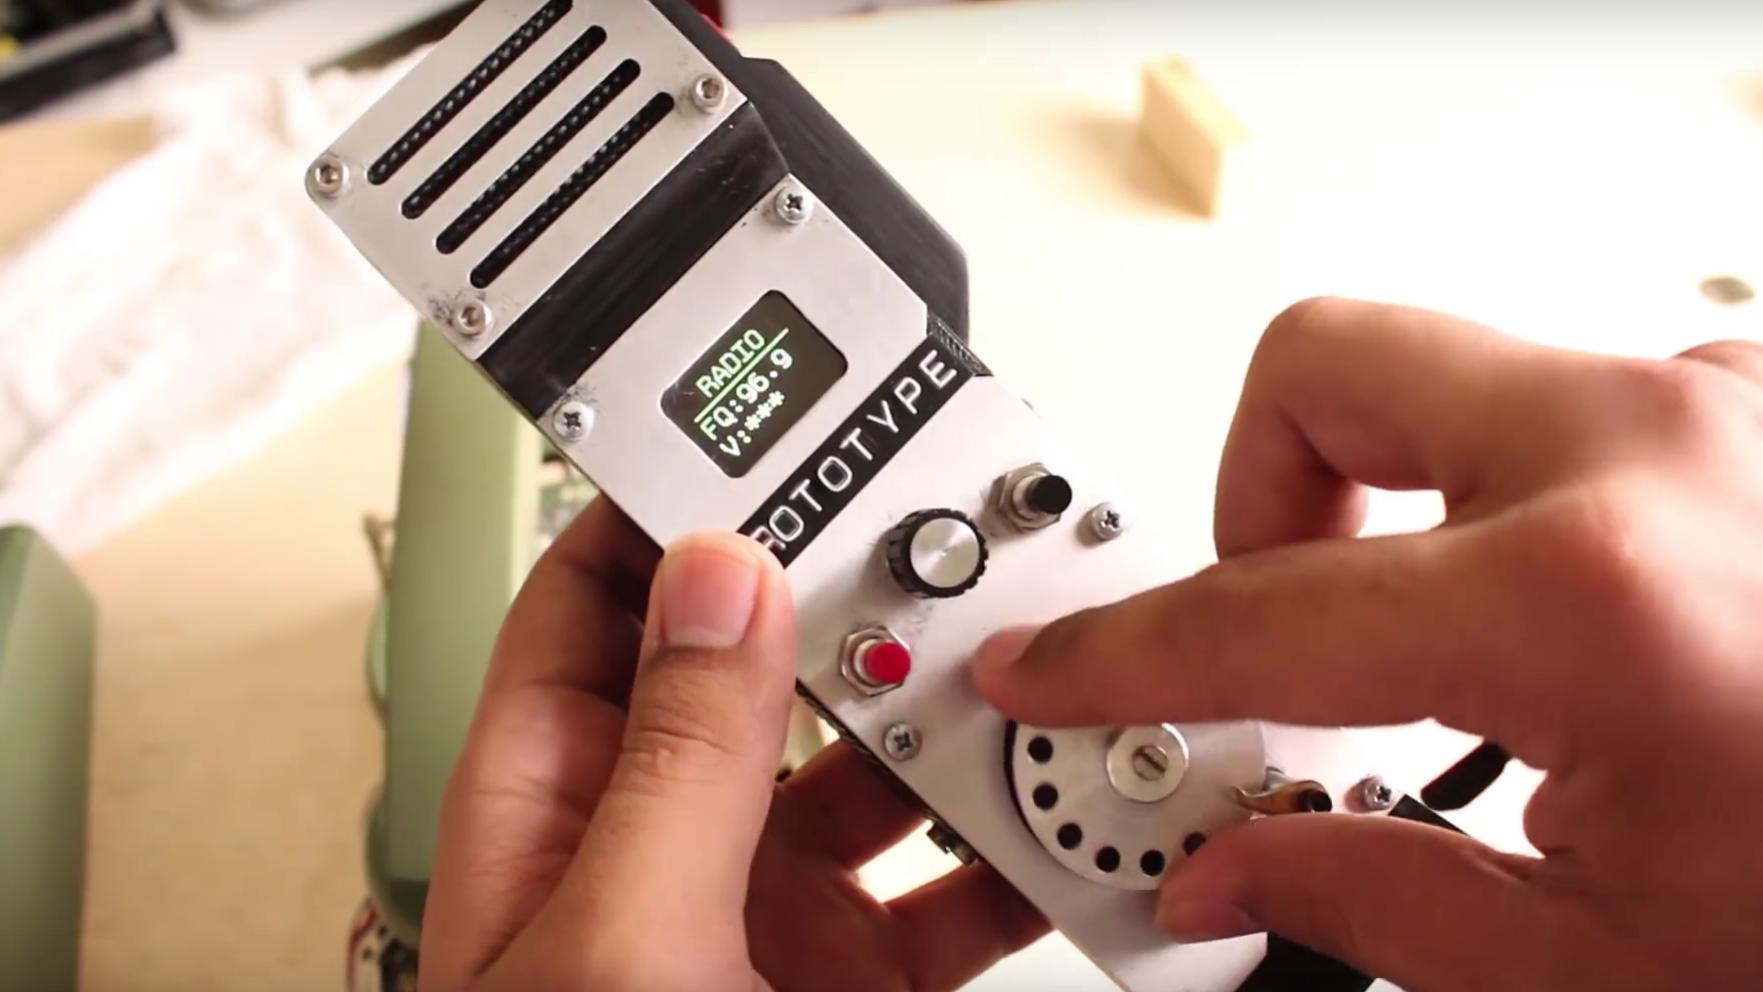 Dette er verdens første mobiltelefon med nummerskive